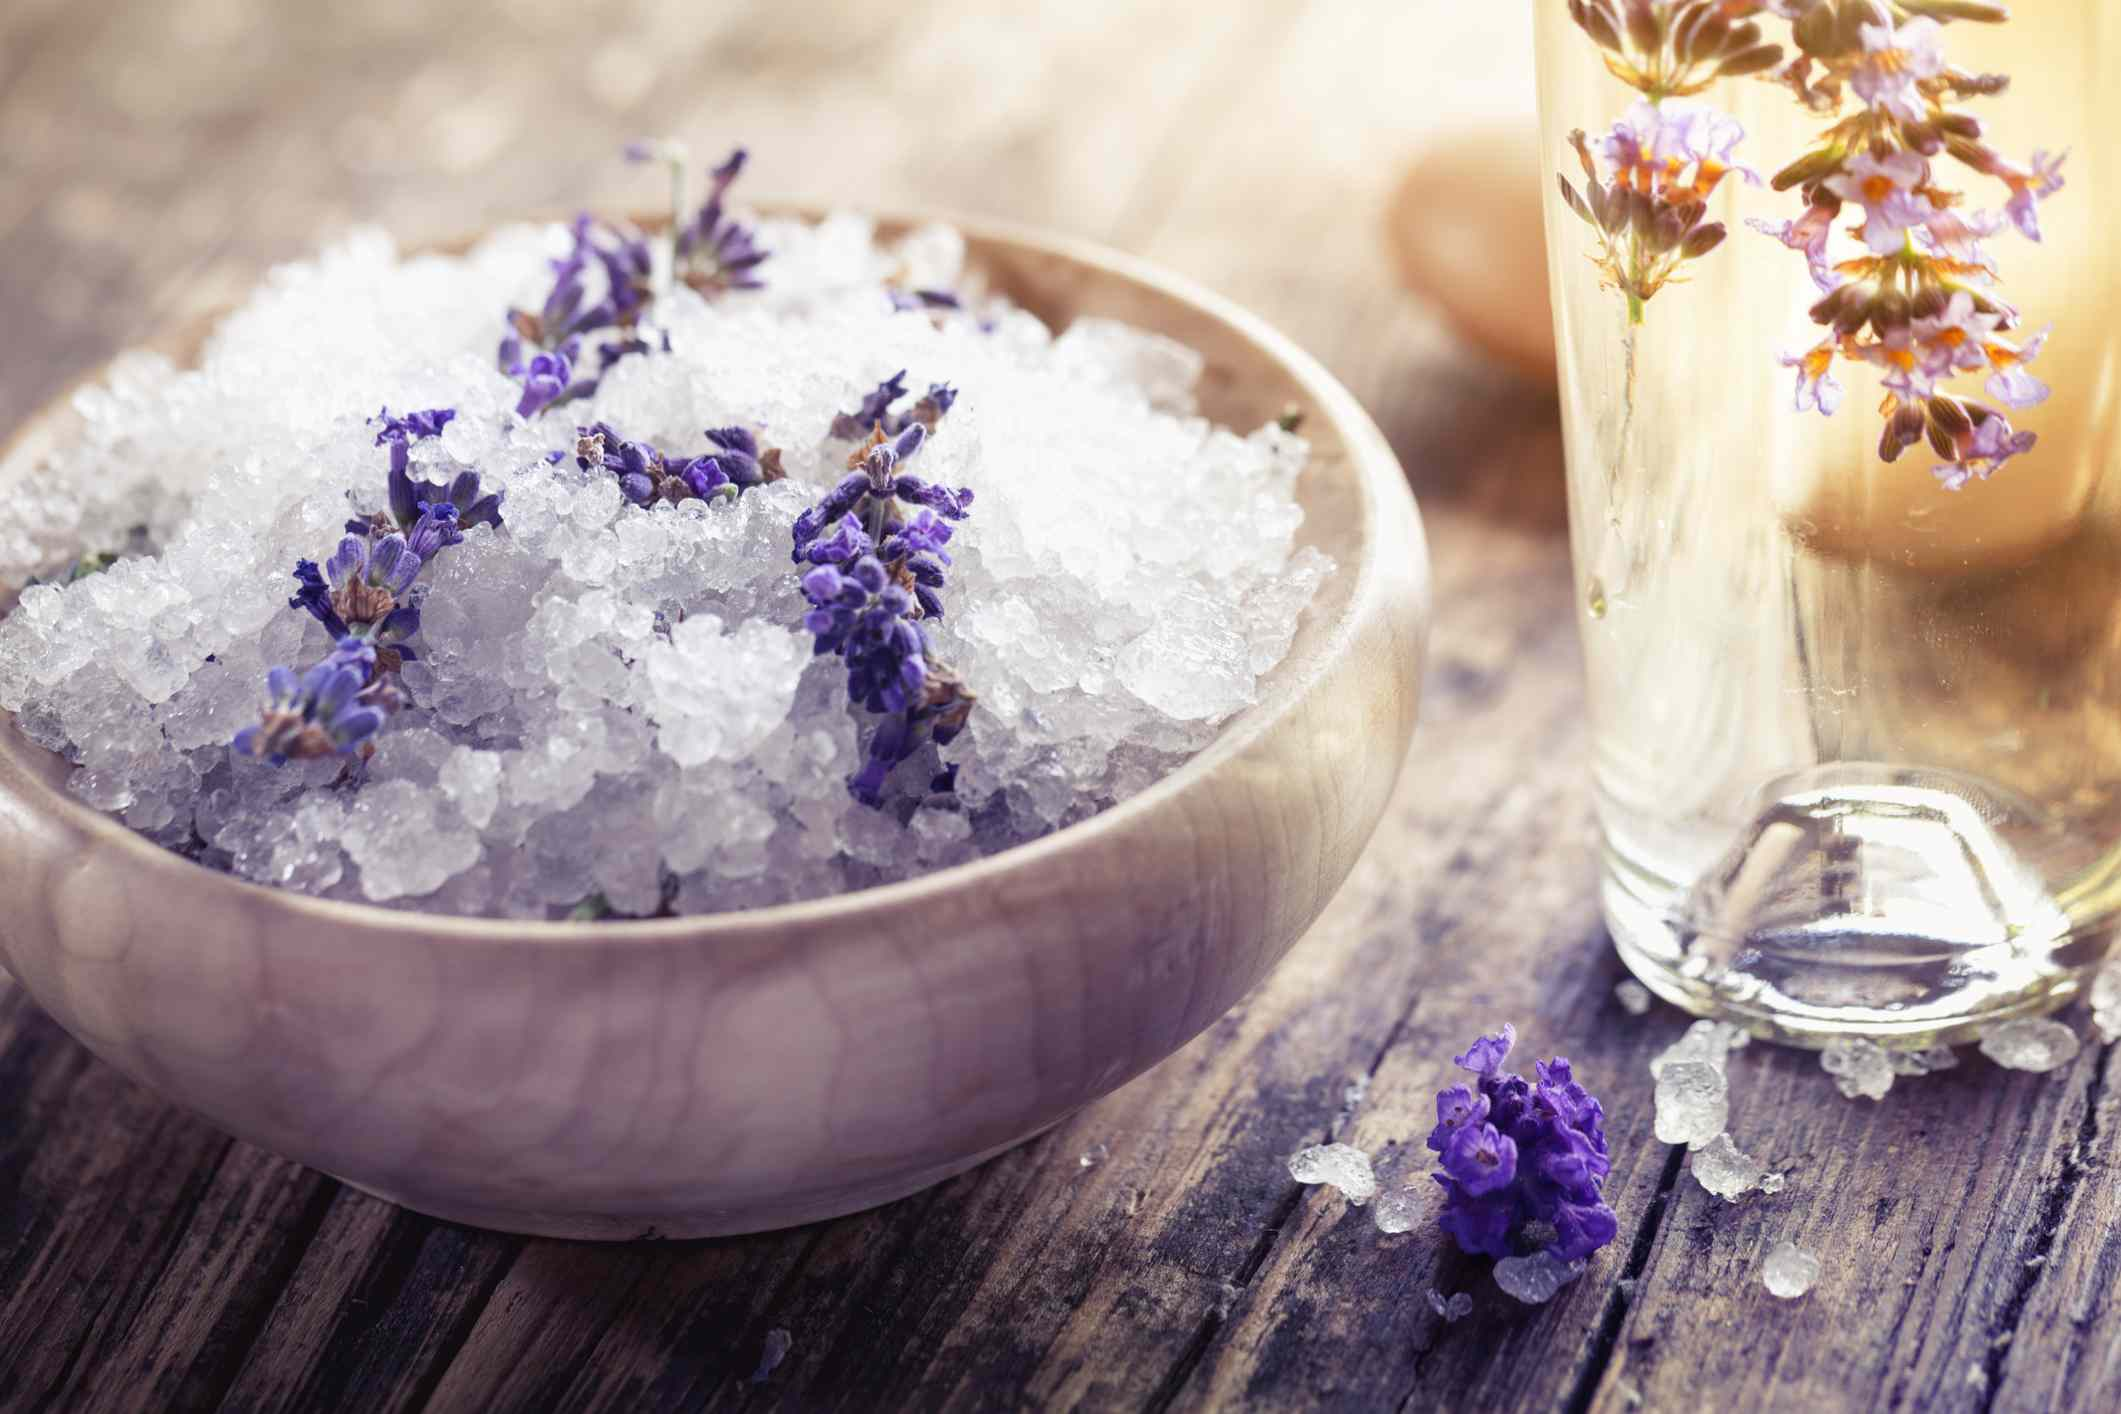 Lavender aromatherapy bath salt and massage oil